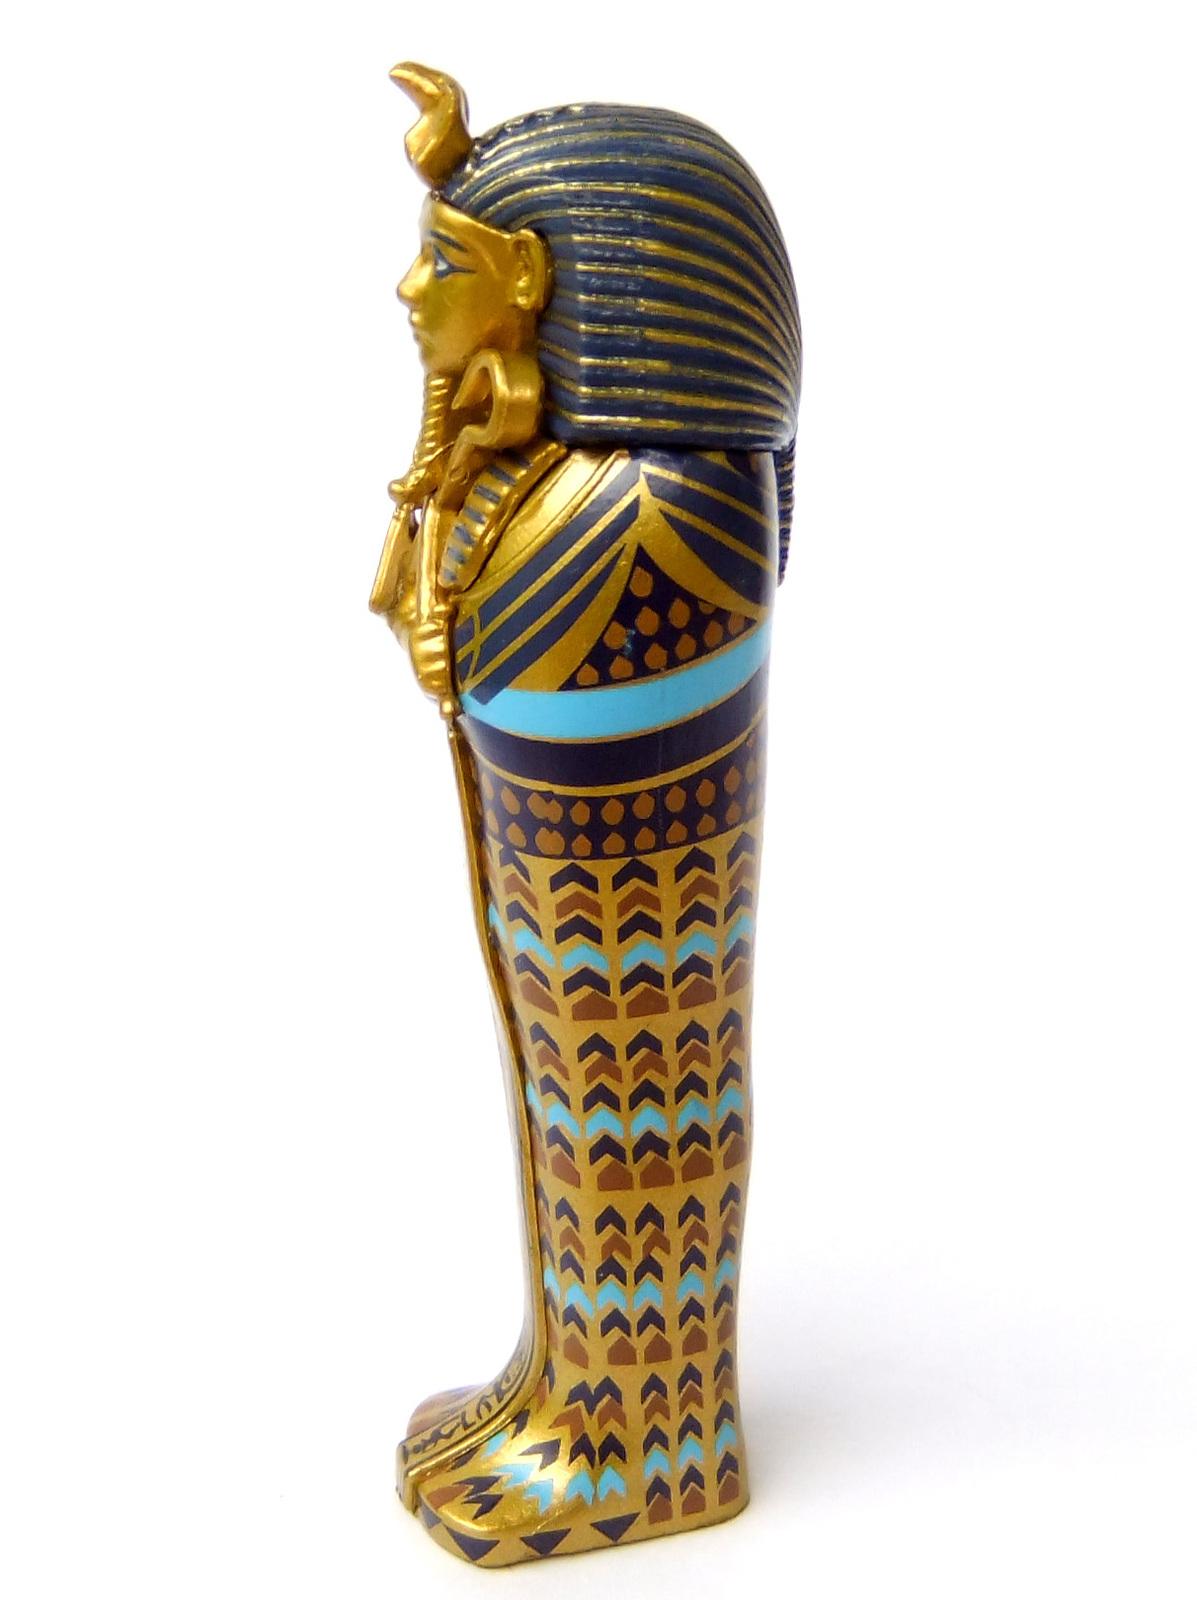 5 Ancient Egyptian Pharaoh Tutankhamun Gold Mask Coffin Akhenaten Nefertiti Bust